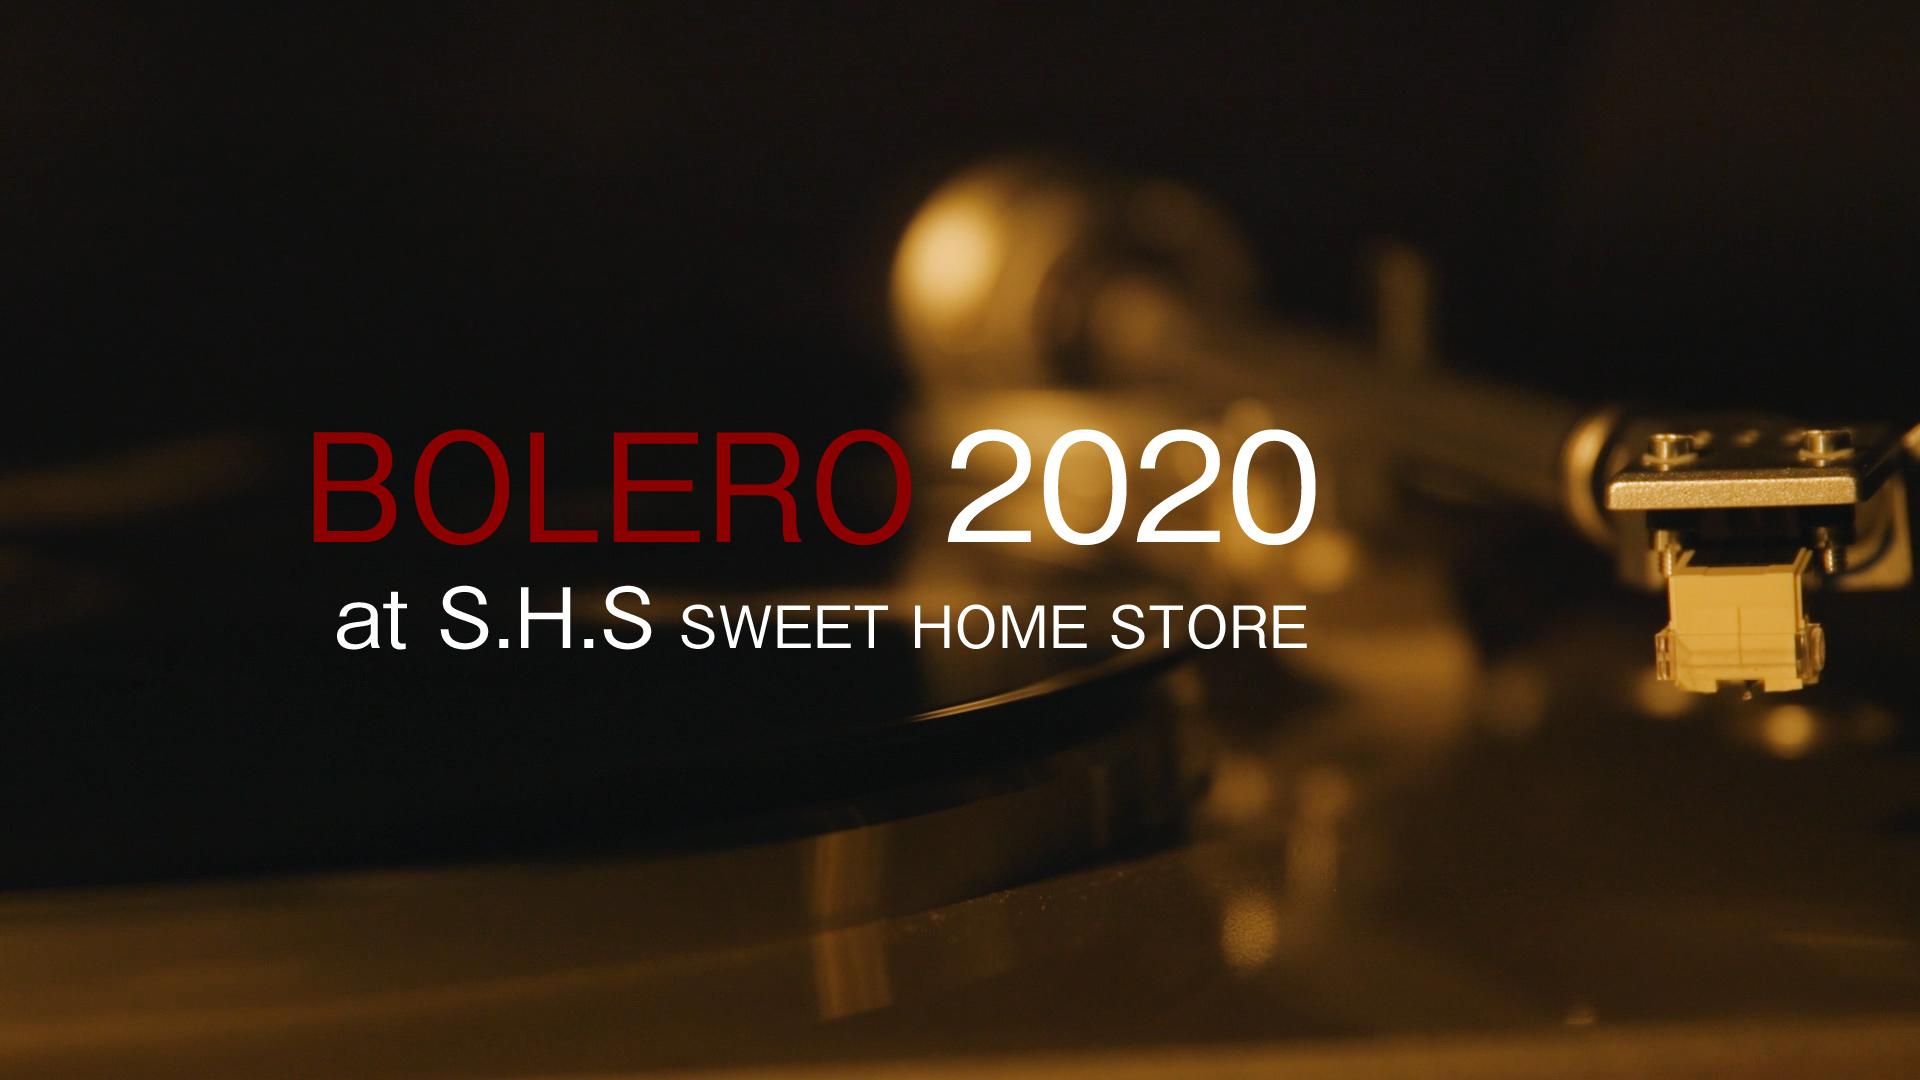 Noism映像舞踊『BOLERO 2020』CINE WIND特別上映&井関佐和子トーク